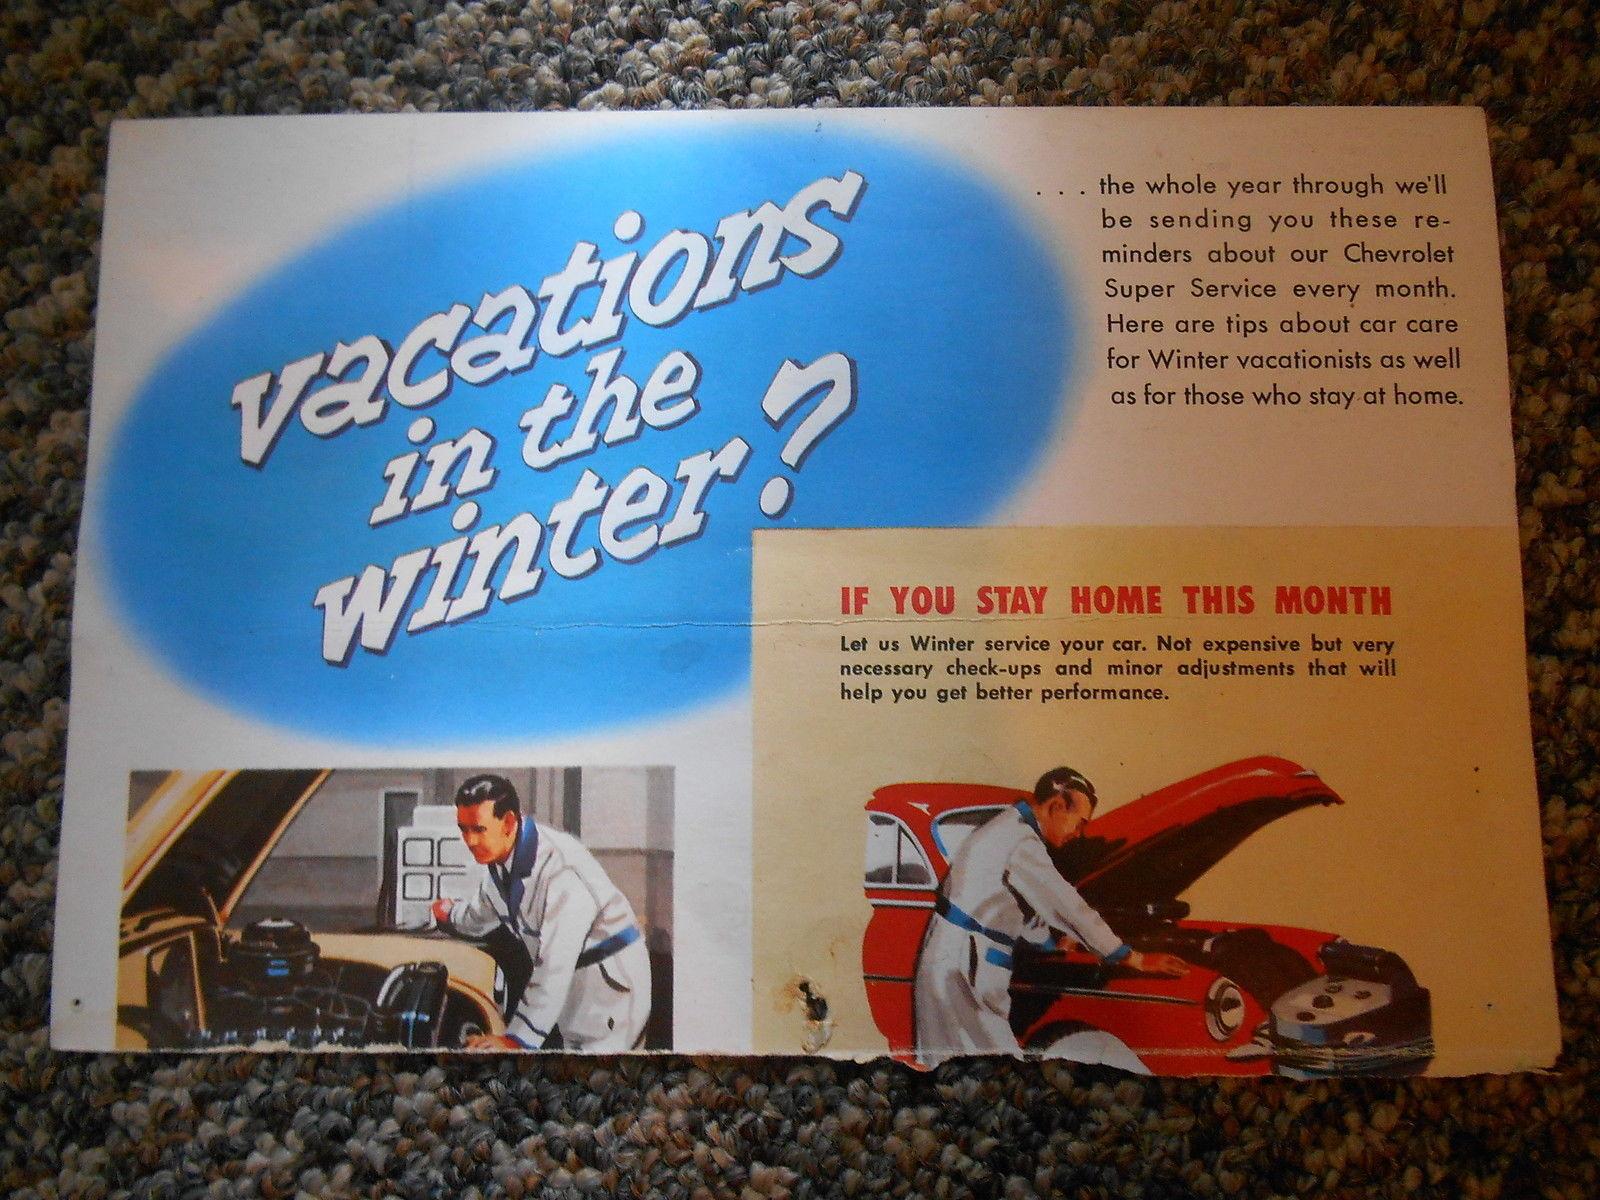 Vintage Calendar Picture Print German Shepherds & Chevrolet Service Advertising